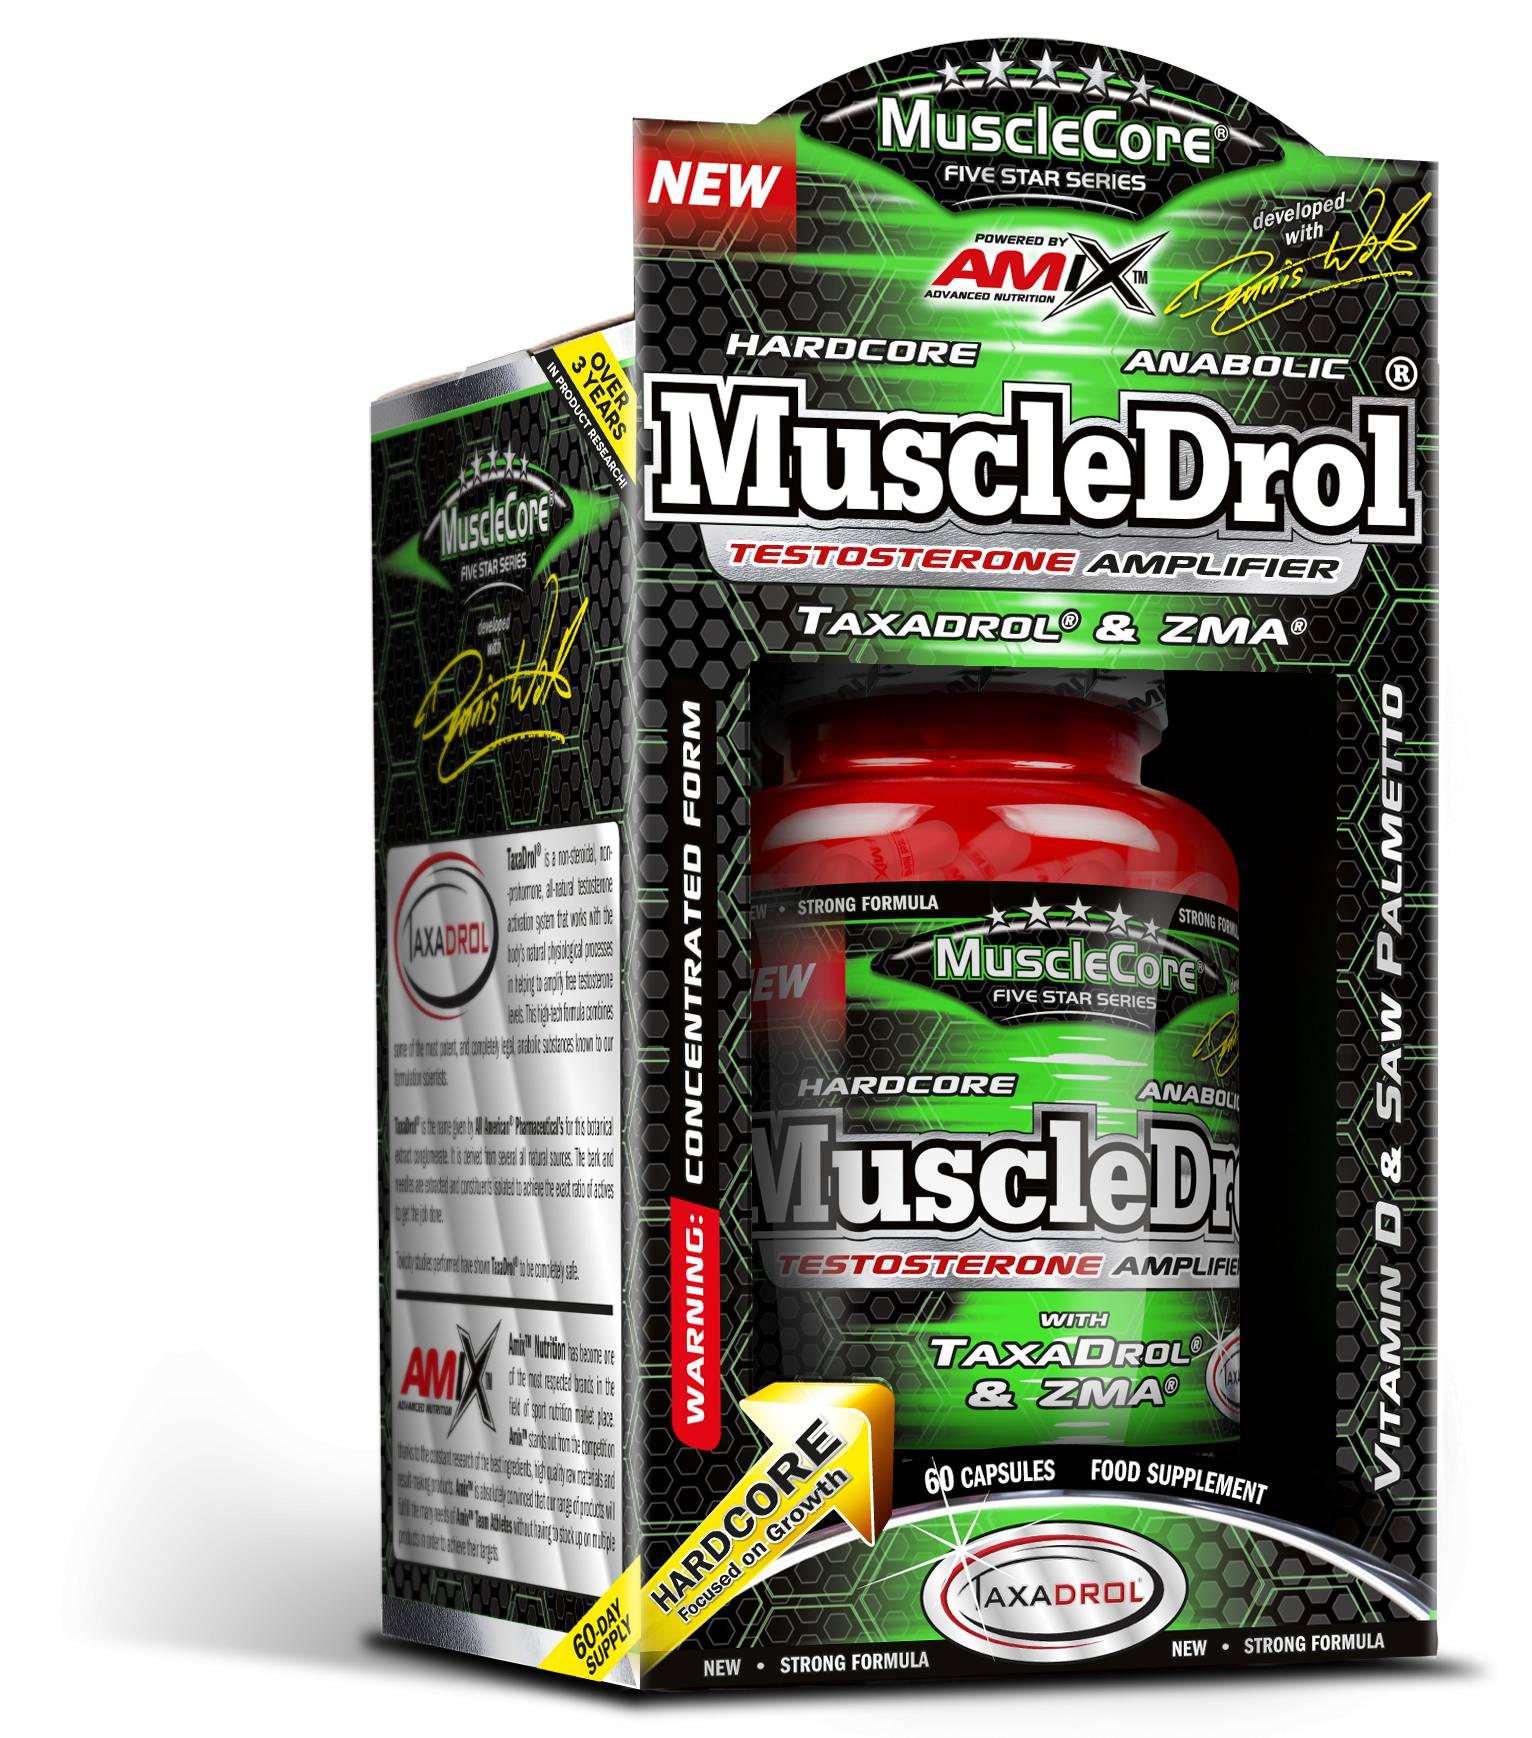 muscledrol